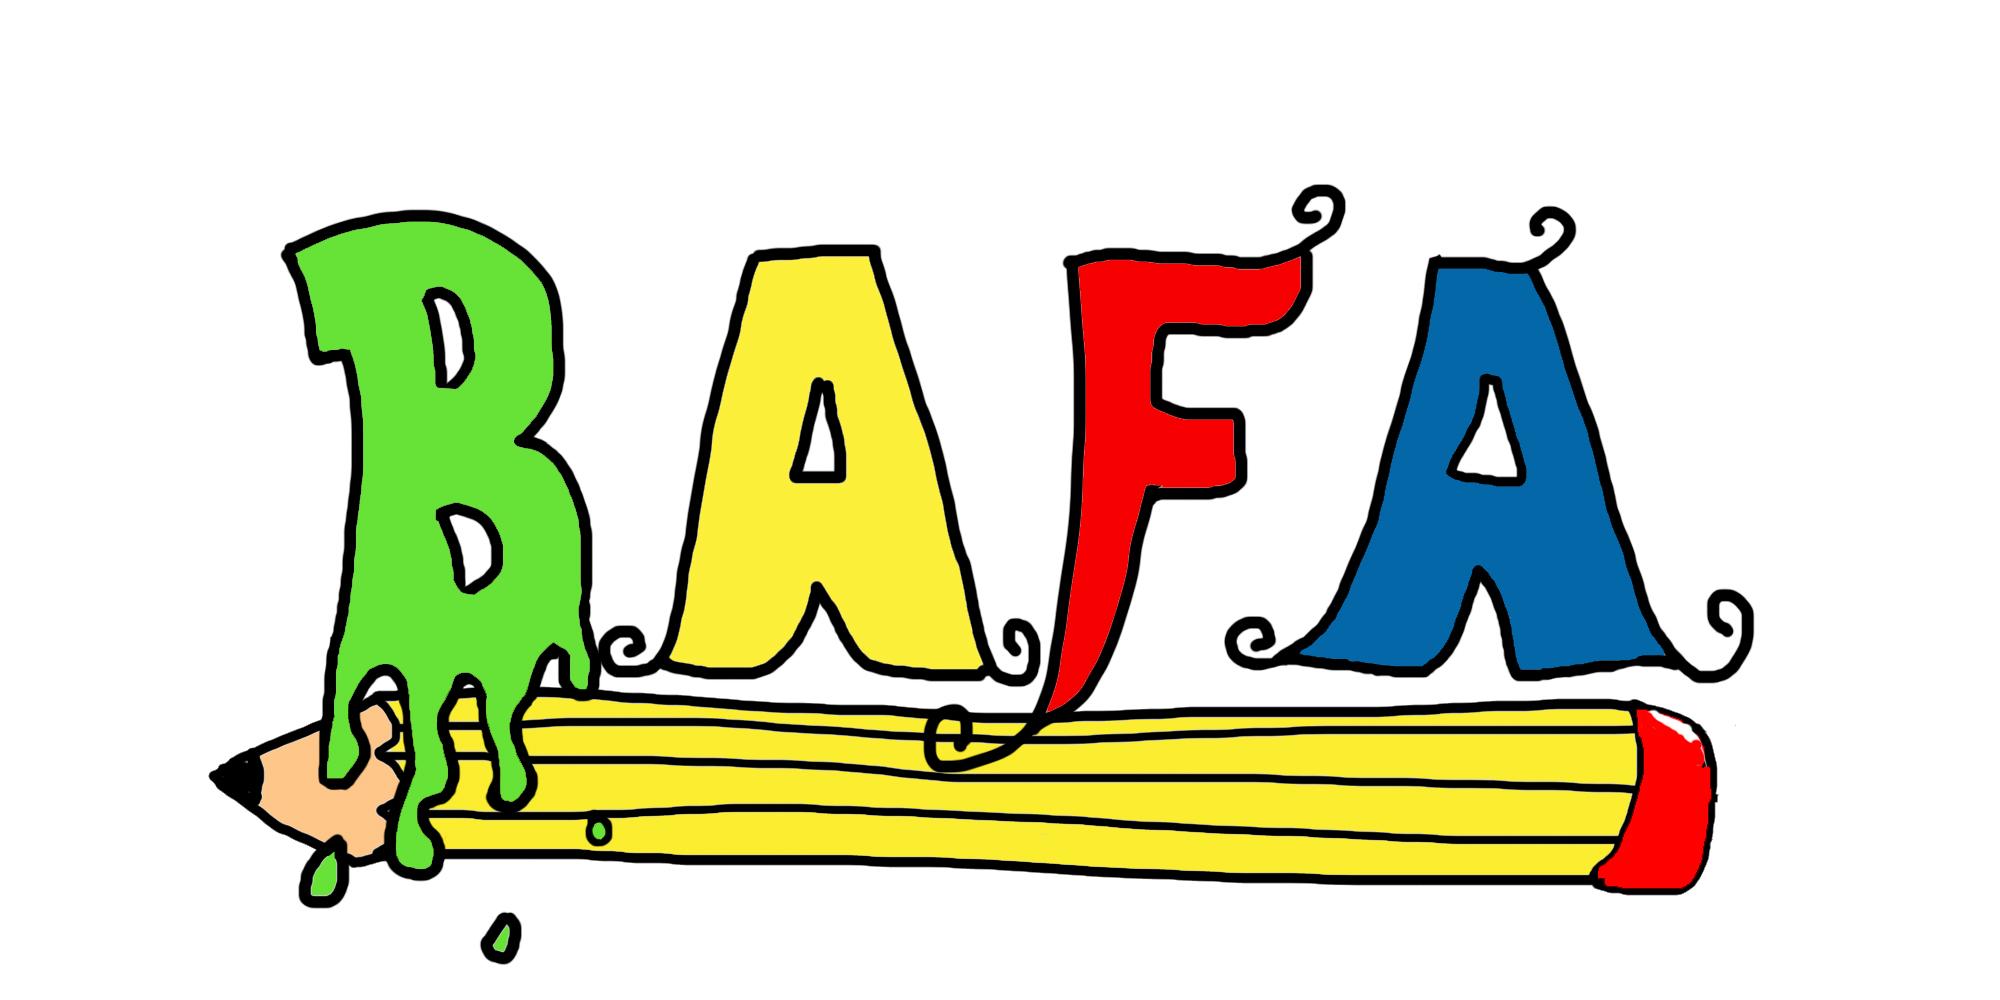 BAFA logo (jazza)